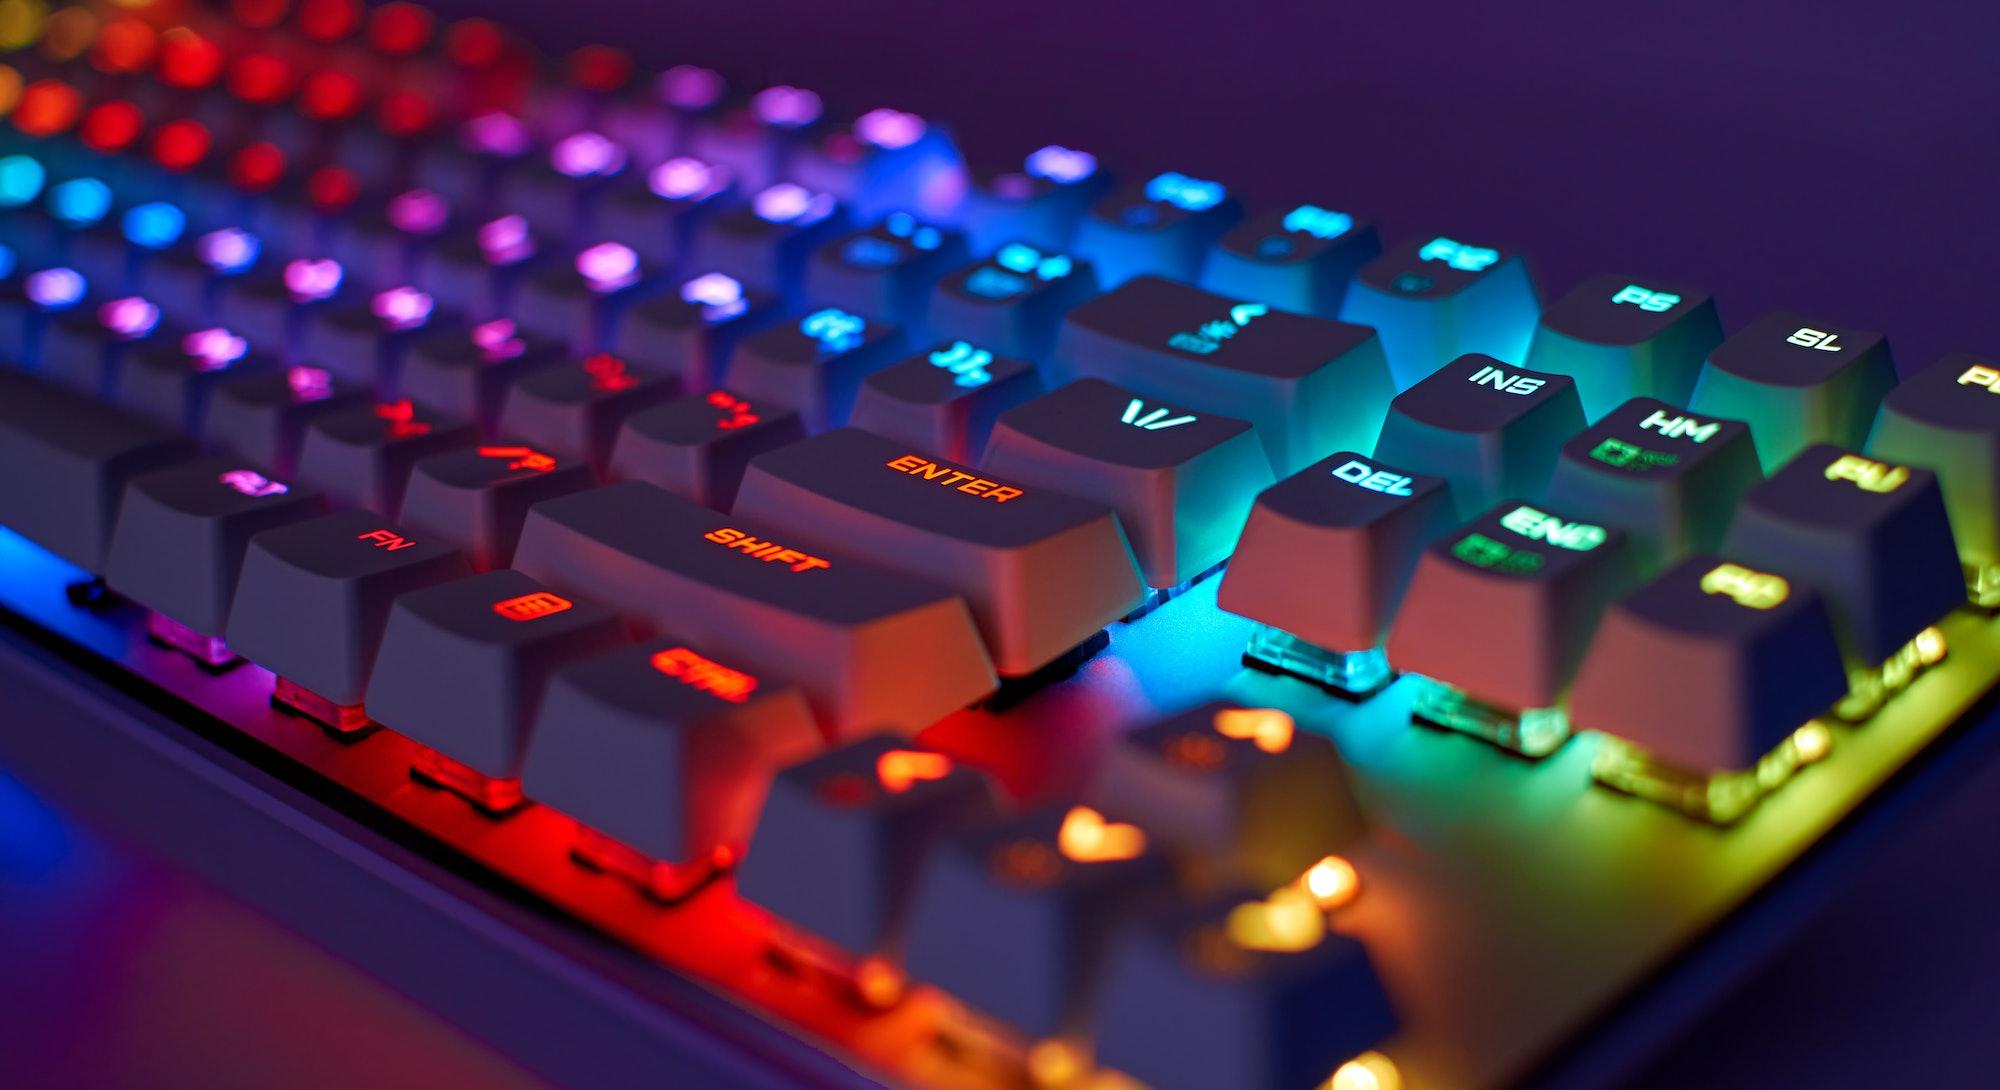 RGB gaming keyboard. Bright colorful keyboard, soft focus. Mechanical keyboard with RGB light, blurr...